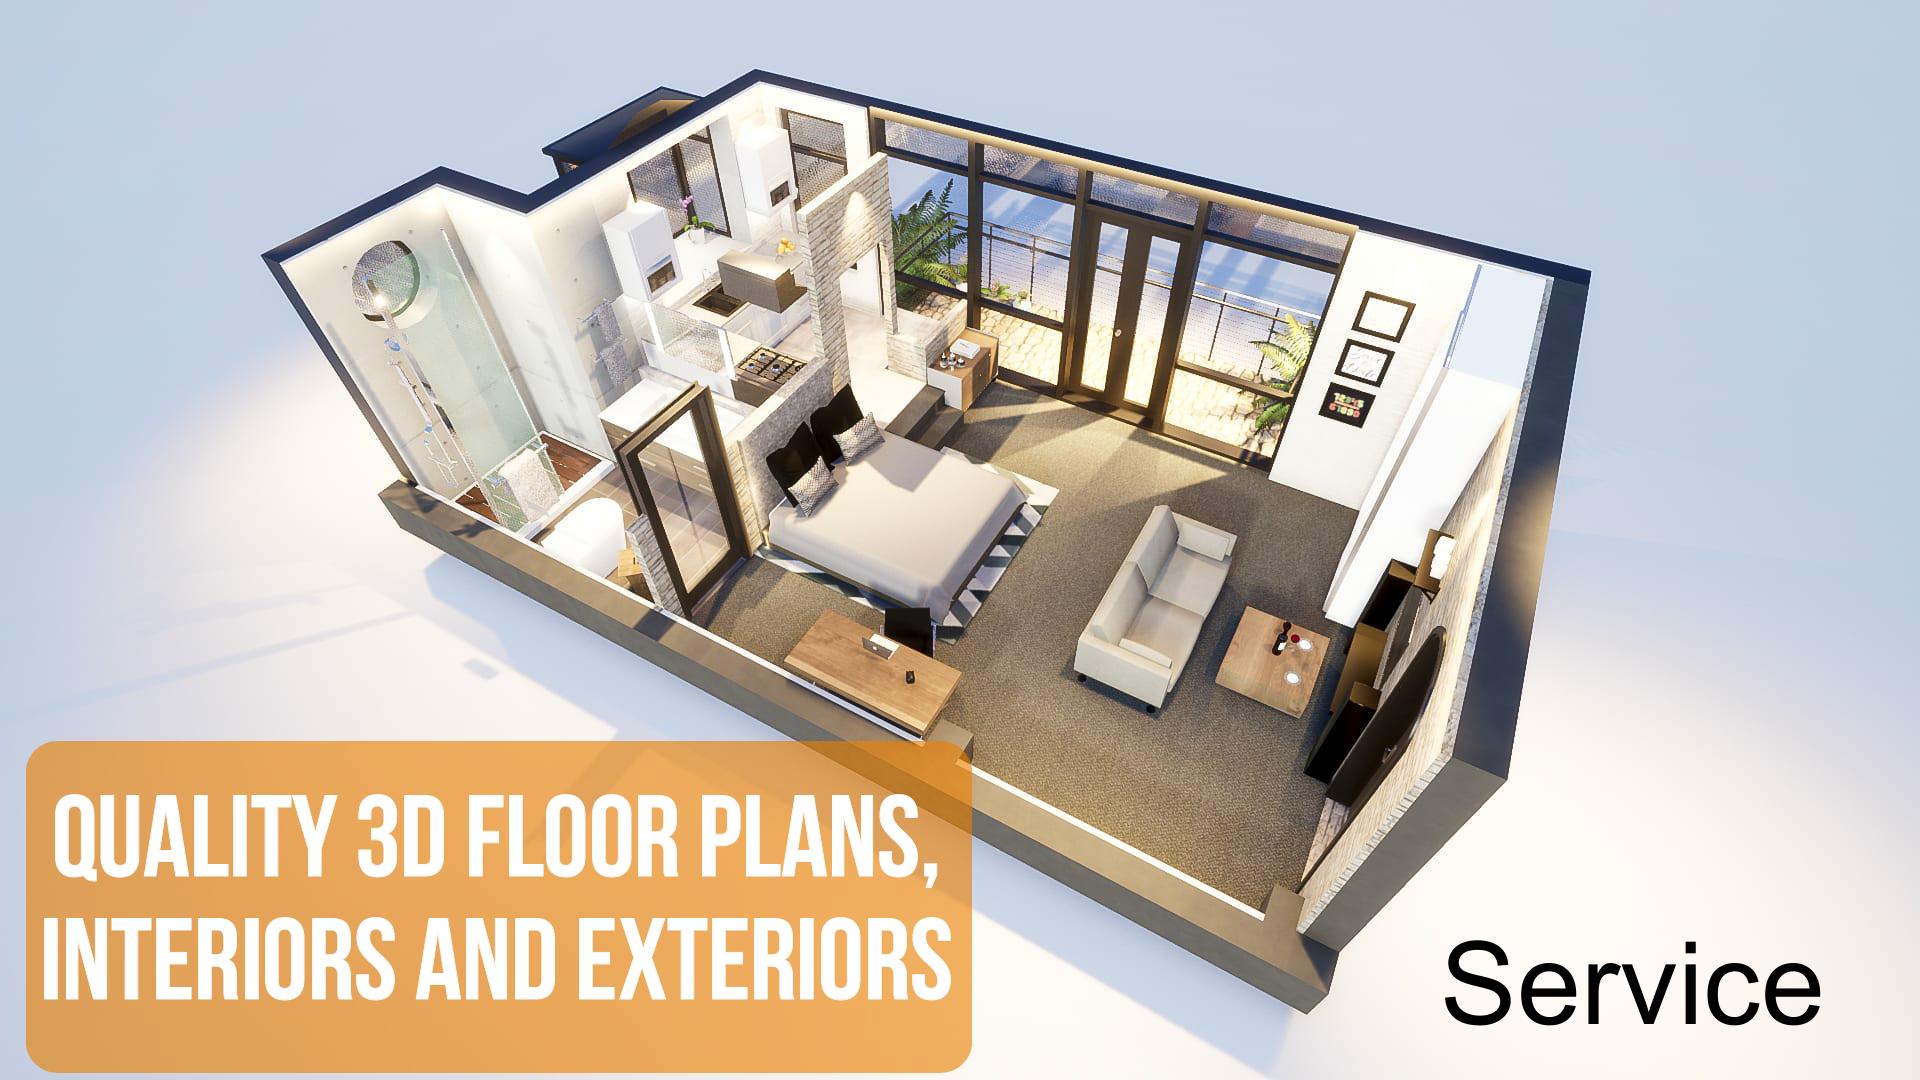 I Will Create Quality 3d Floor Plans Interiors And Exteriors Interior And Exterior Rendered Floor Plan Floor Plans